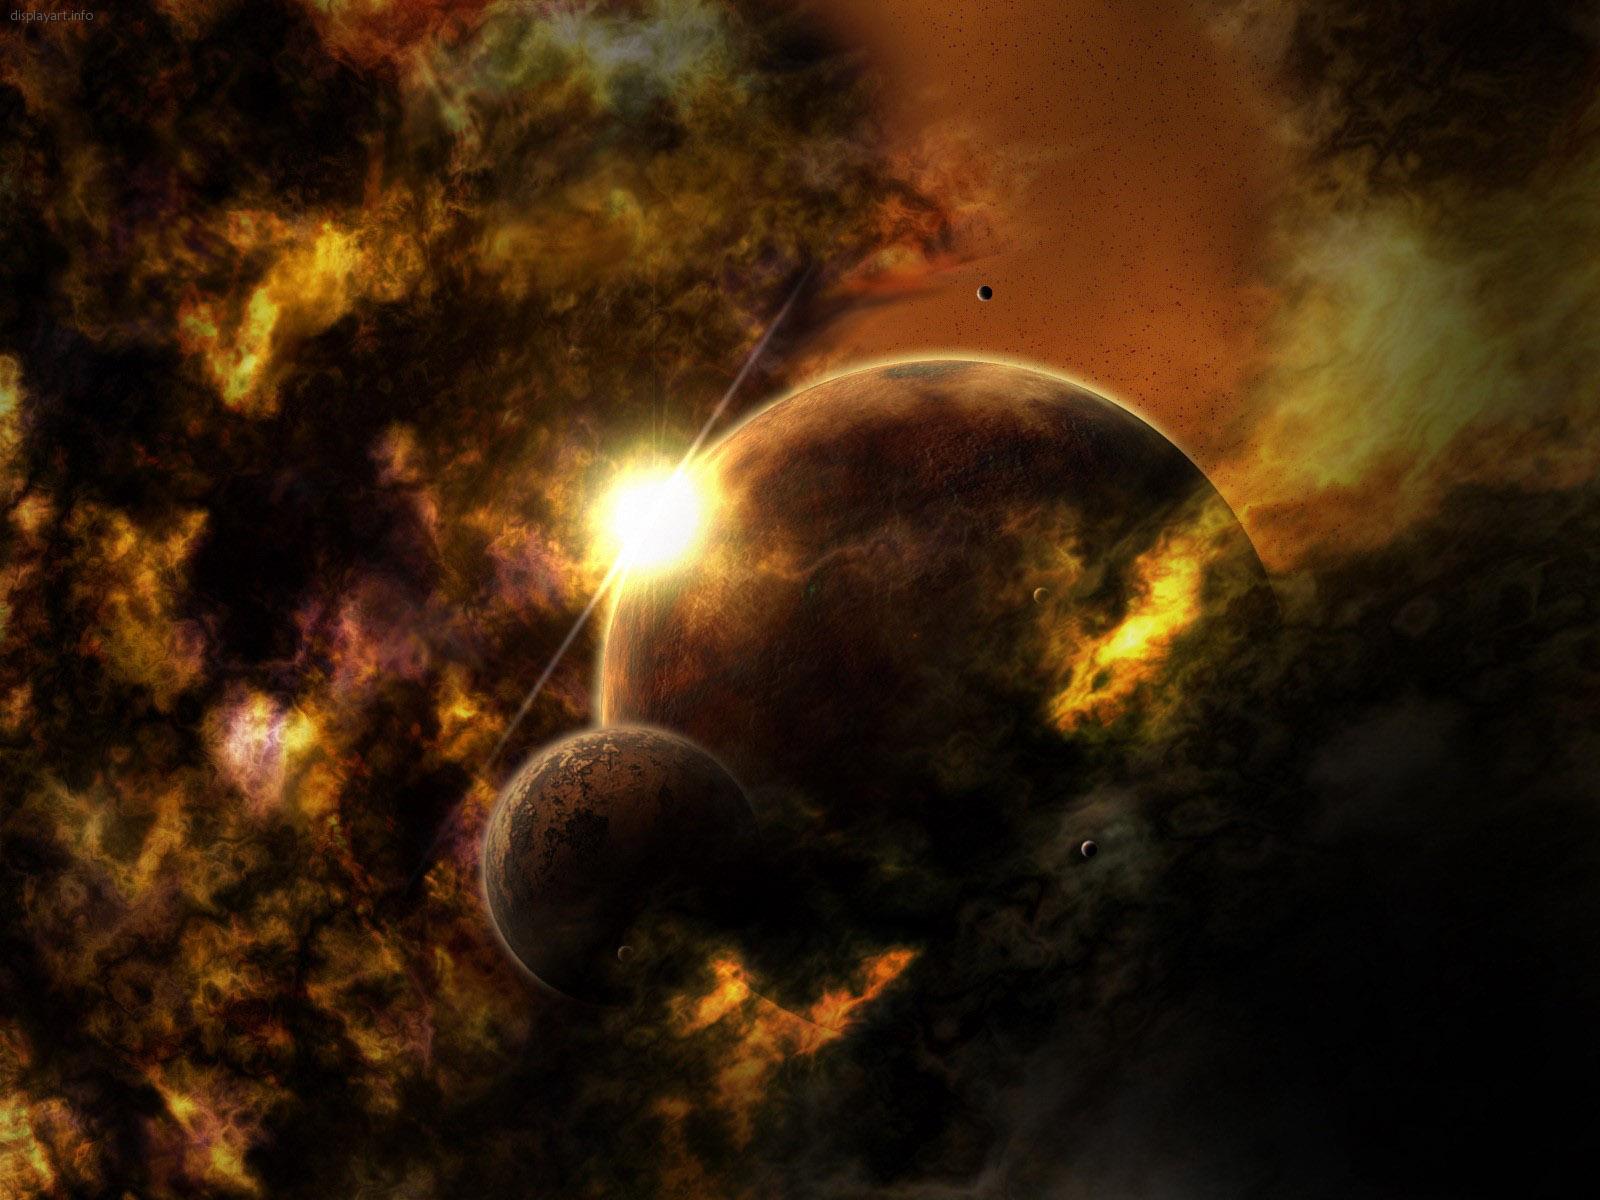 Fantasy Space Wallpaper